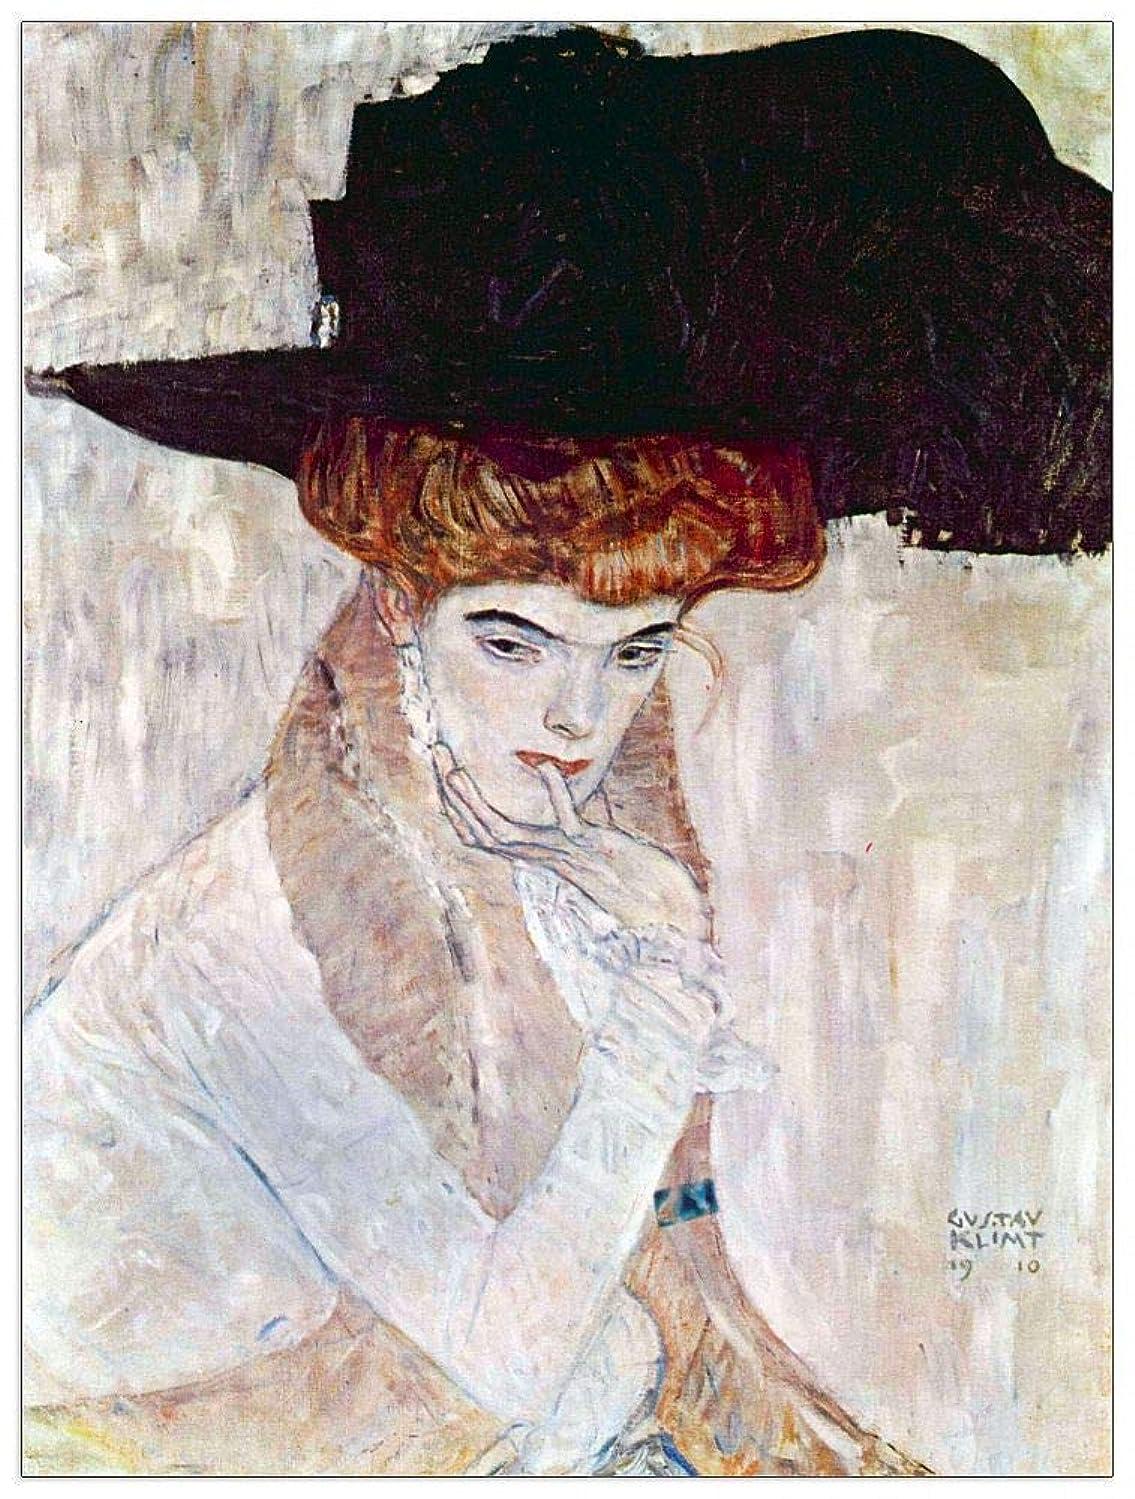 ArtPlaza TW90452 Klimt Gustav - The Black Hat Decorative Panel 39.5x51 Inch Multicolored